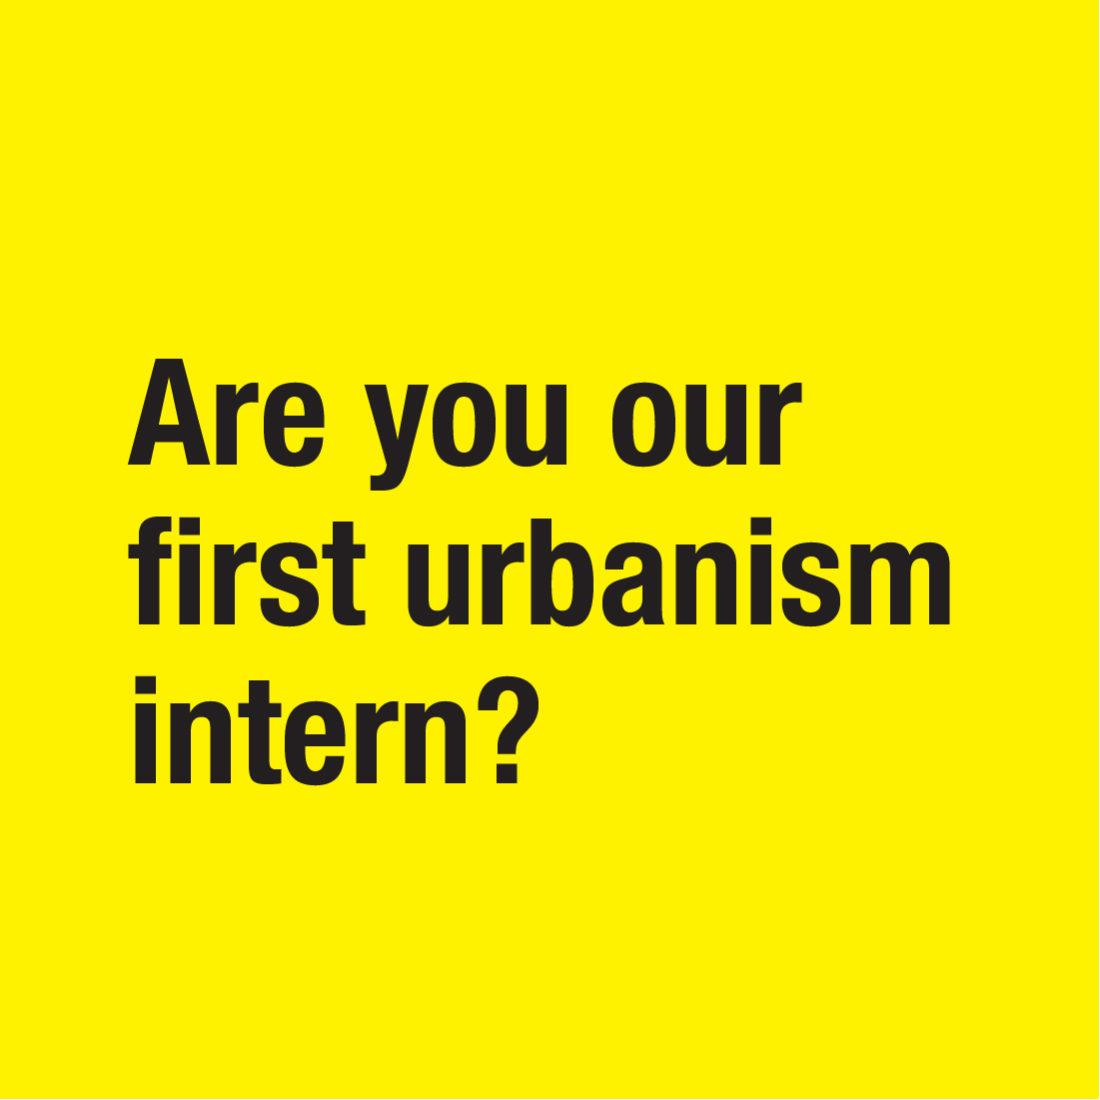 Urbanism intern 01